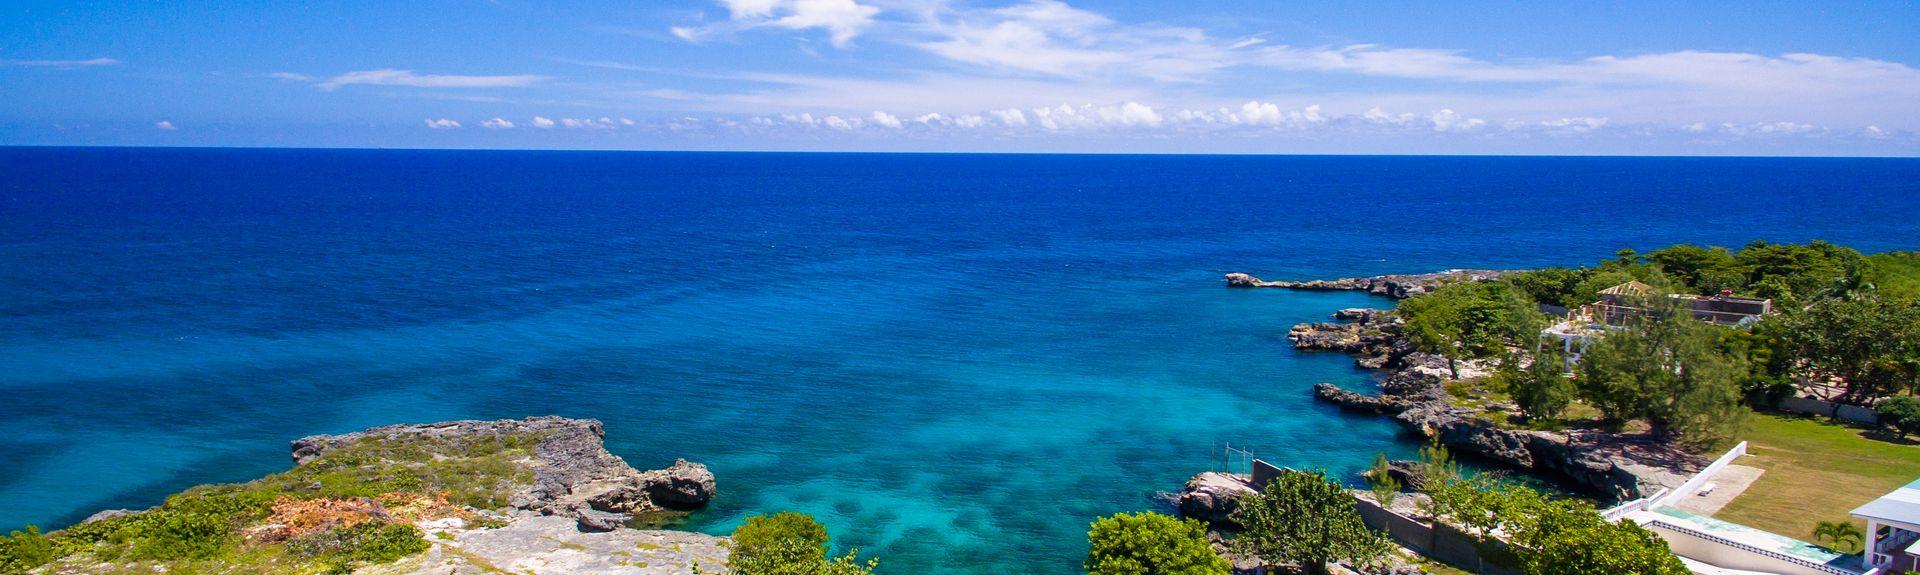 Island Village, Ocho Rios, Middlesex County, Jamaica